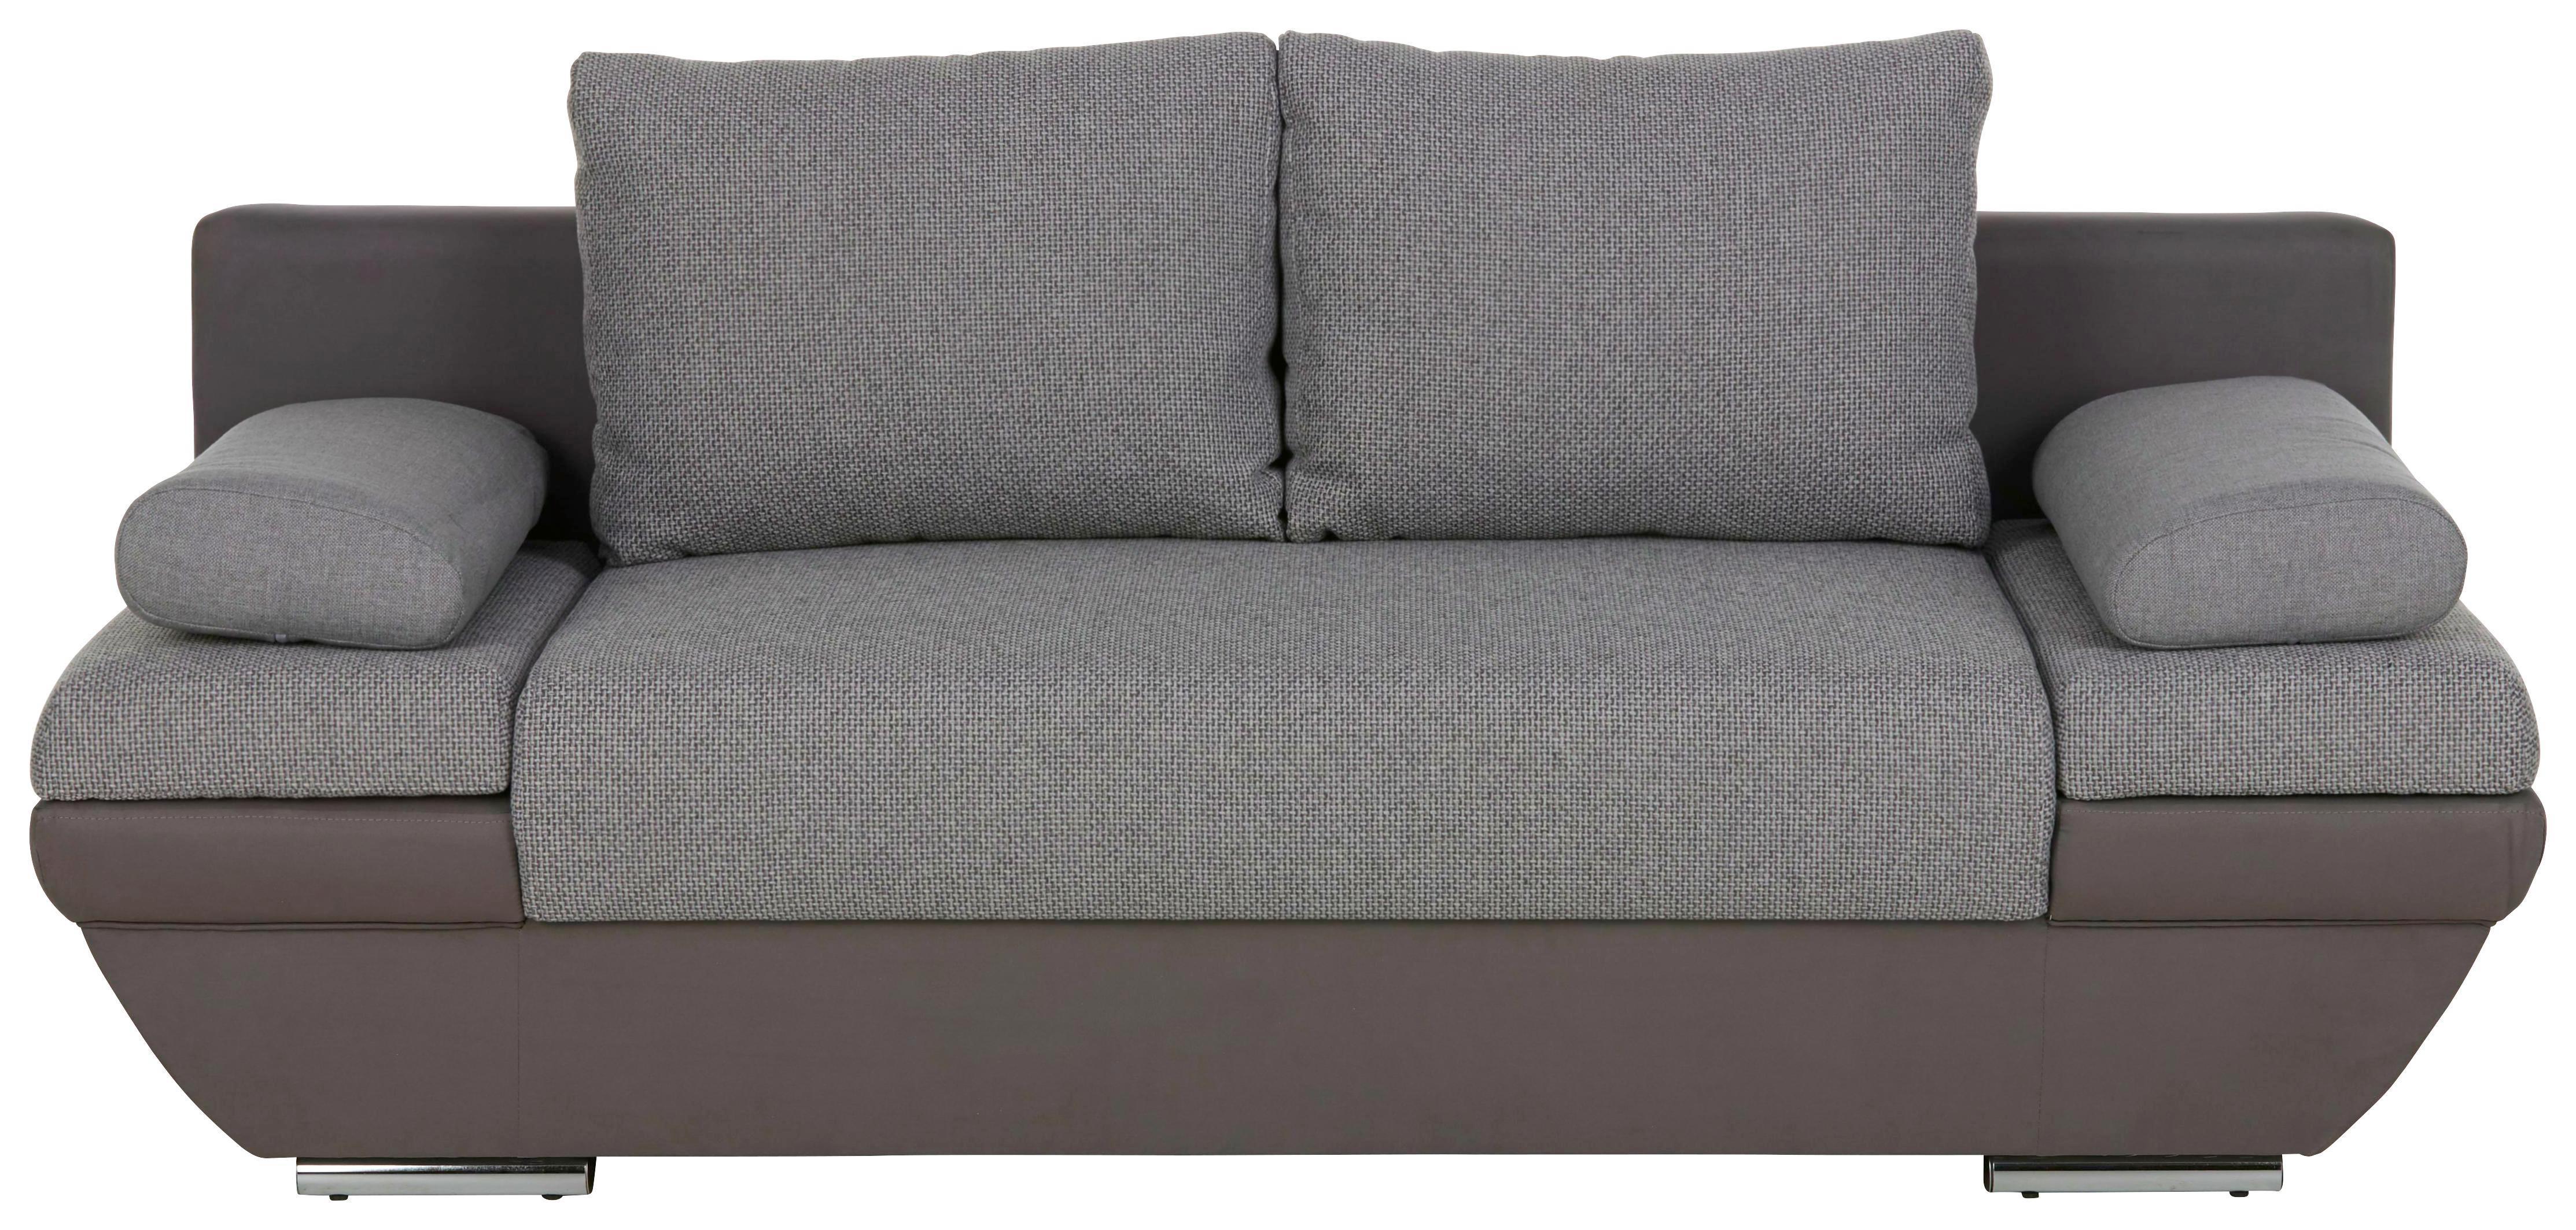 schlafsofa liegeflche 180x200 top malou sofa mit gstebett. Black Bedroom Furniture Sets. Home Design Ideas